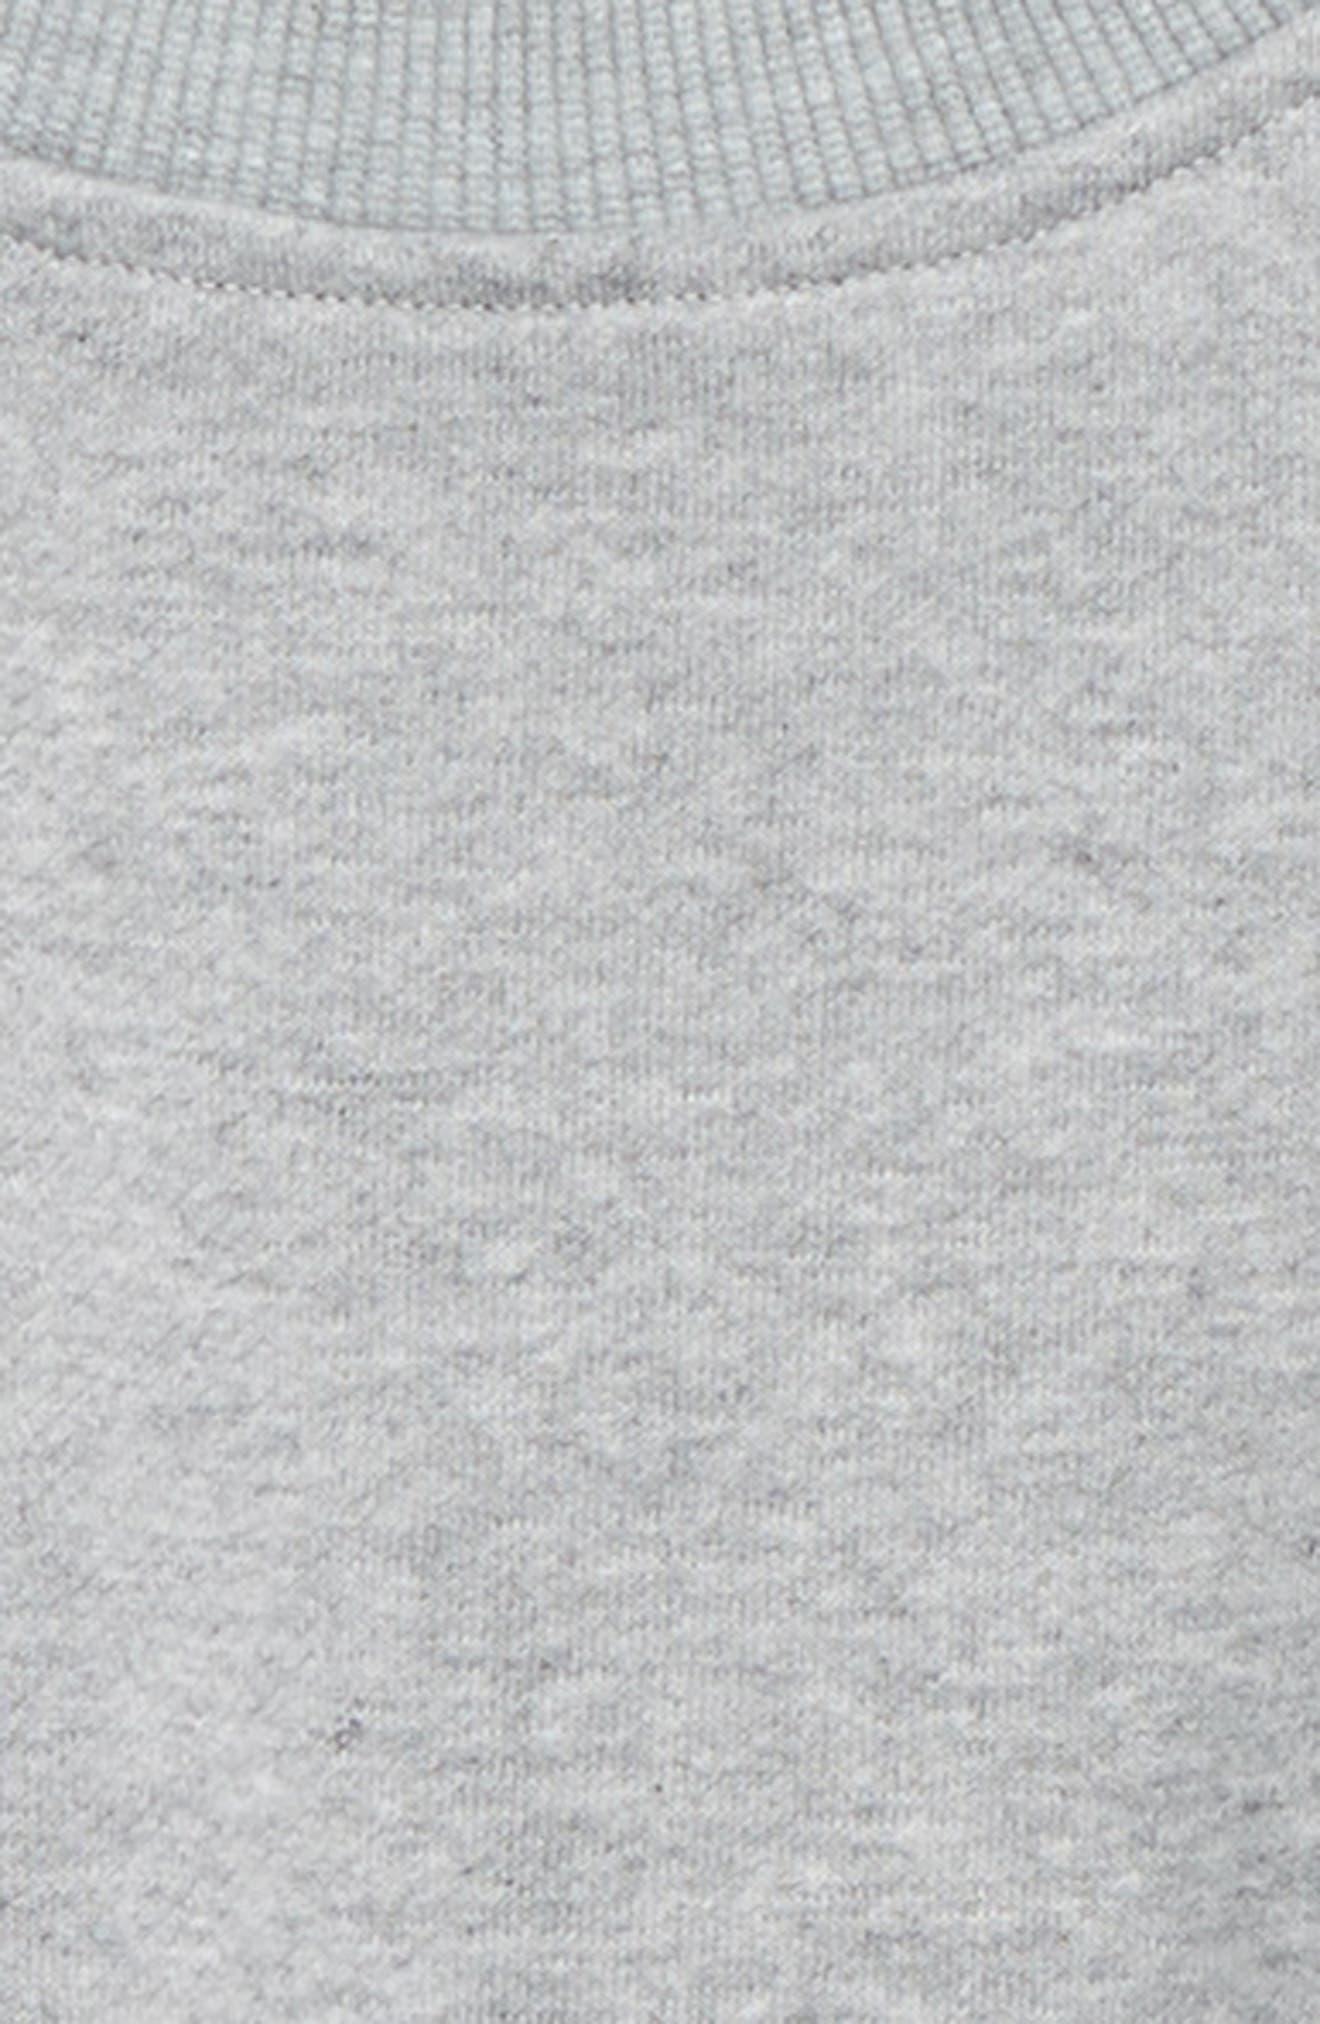 Denim Sleeve Sweatshirt,                             Alternate thumbnail 2, color,                             SCHOOL WASH